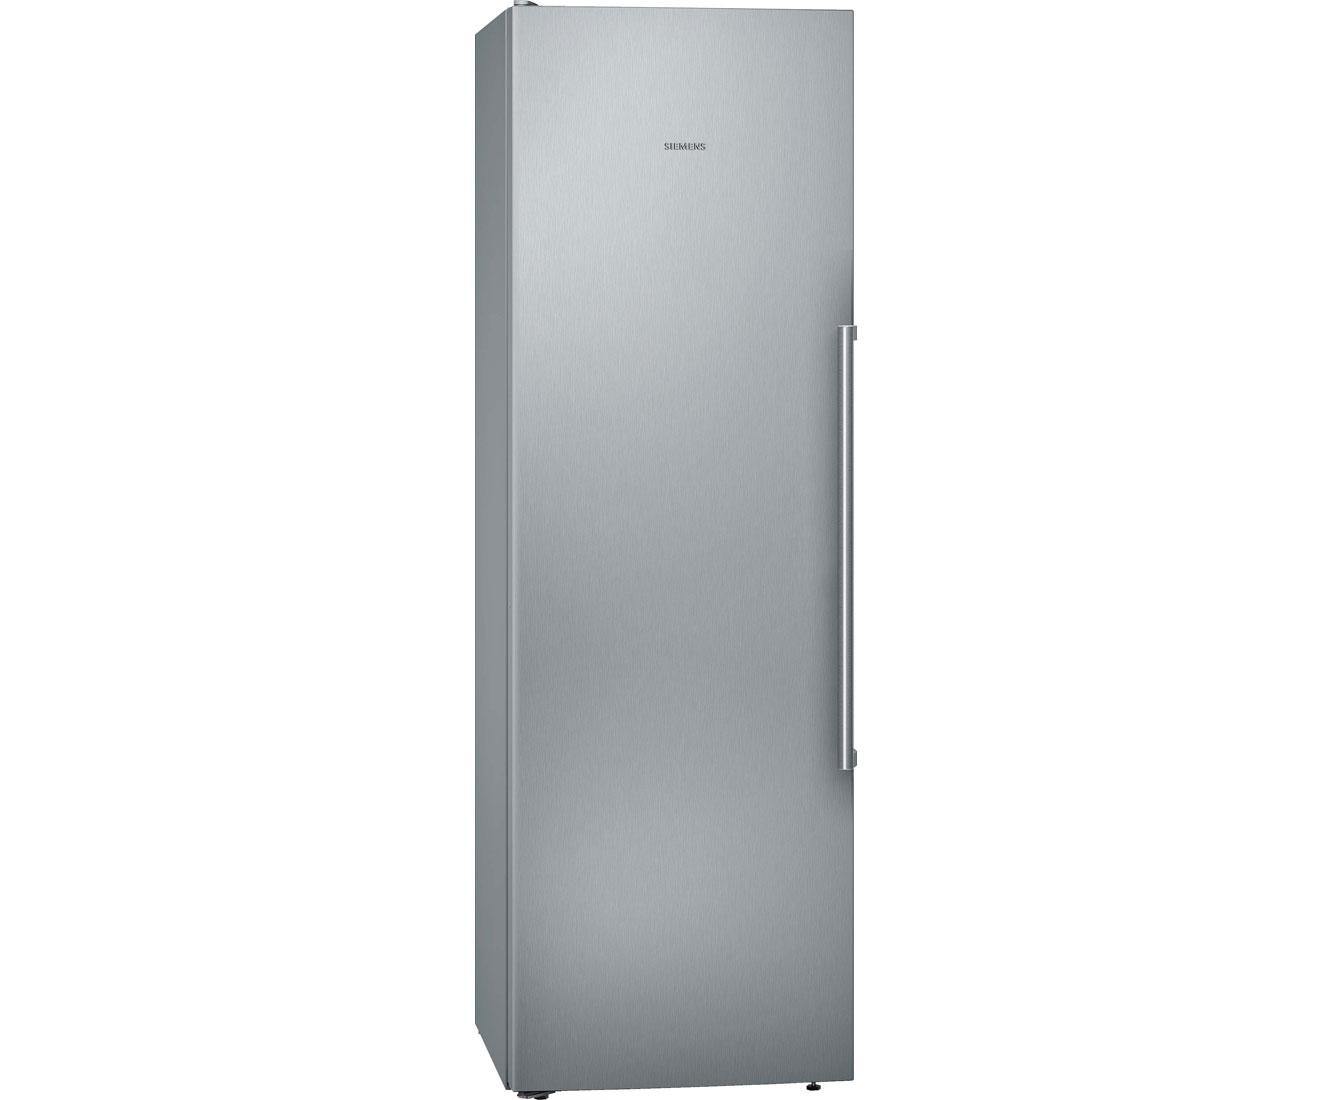 Siemens Kühlschrank Reparatur : Siemens iq700 ks36fpi4p kühlschrank edelstahl a